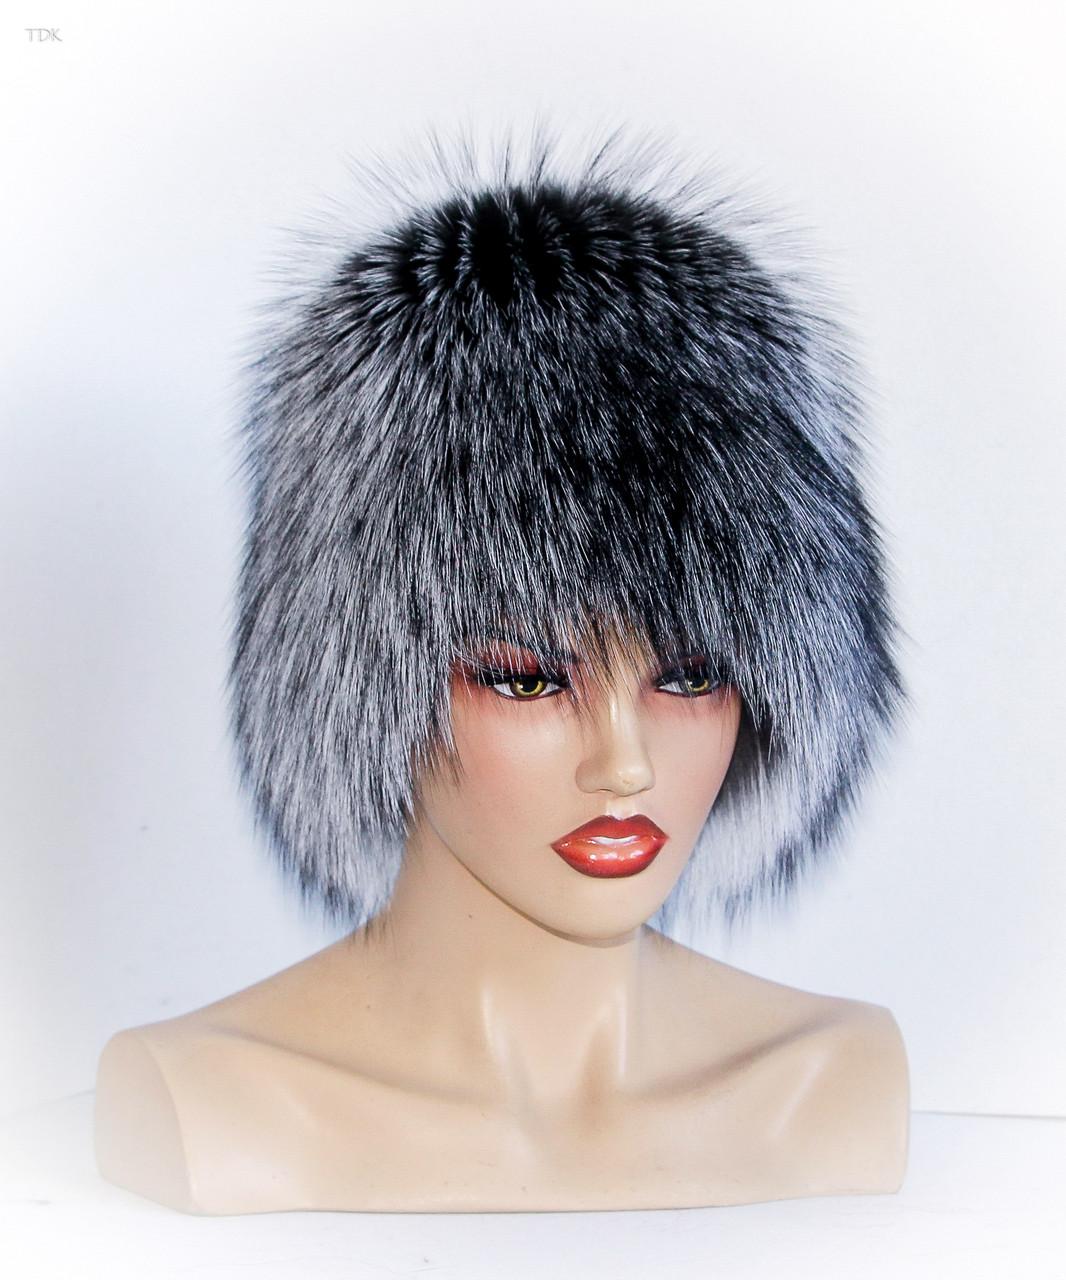 меховая шапка кубанка из чернобурки темная цена 2 050 грн